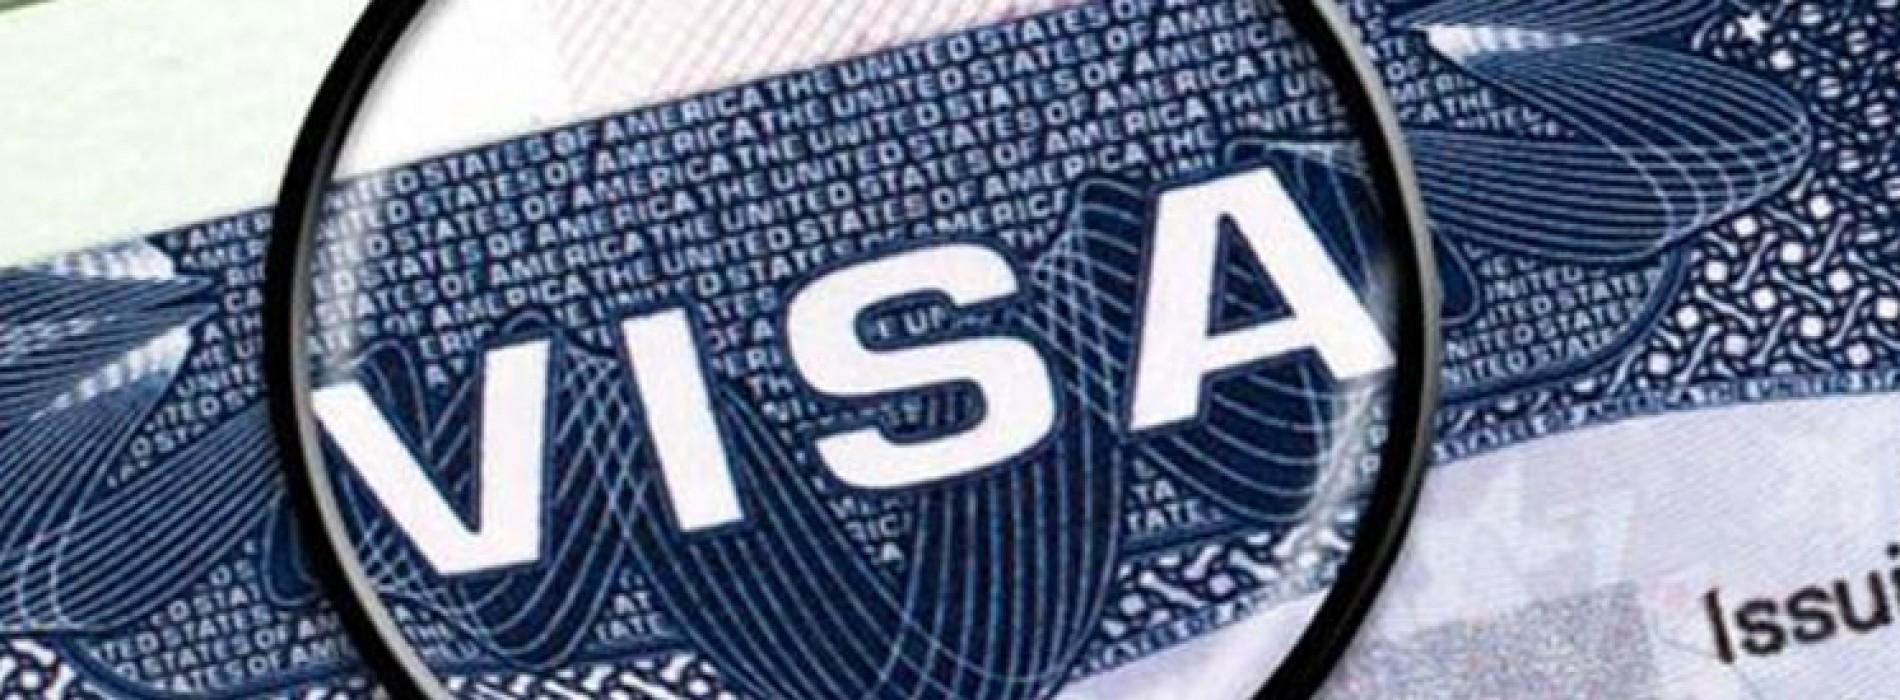 India Announces Extension of e-Tourist Visa scheme to more countries